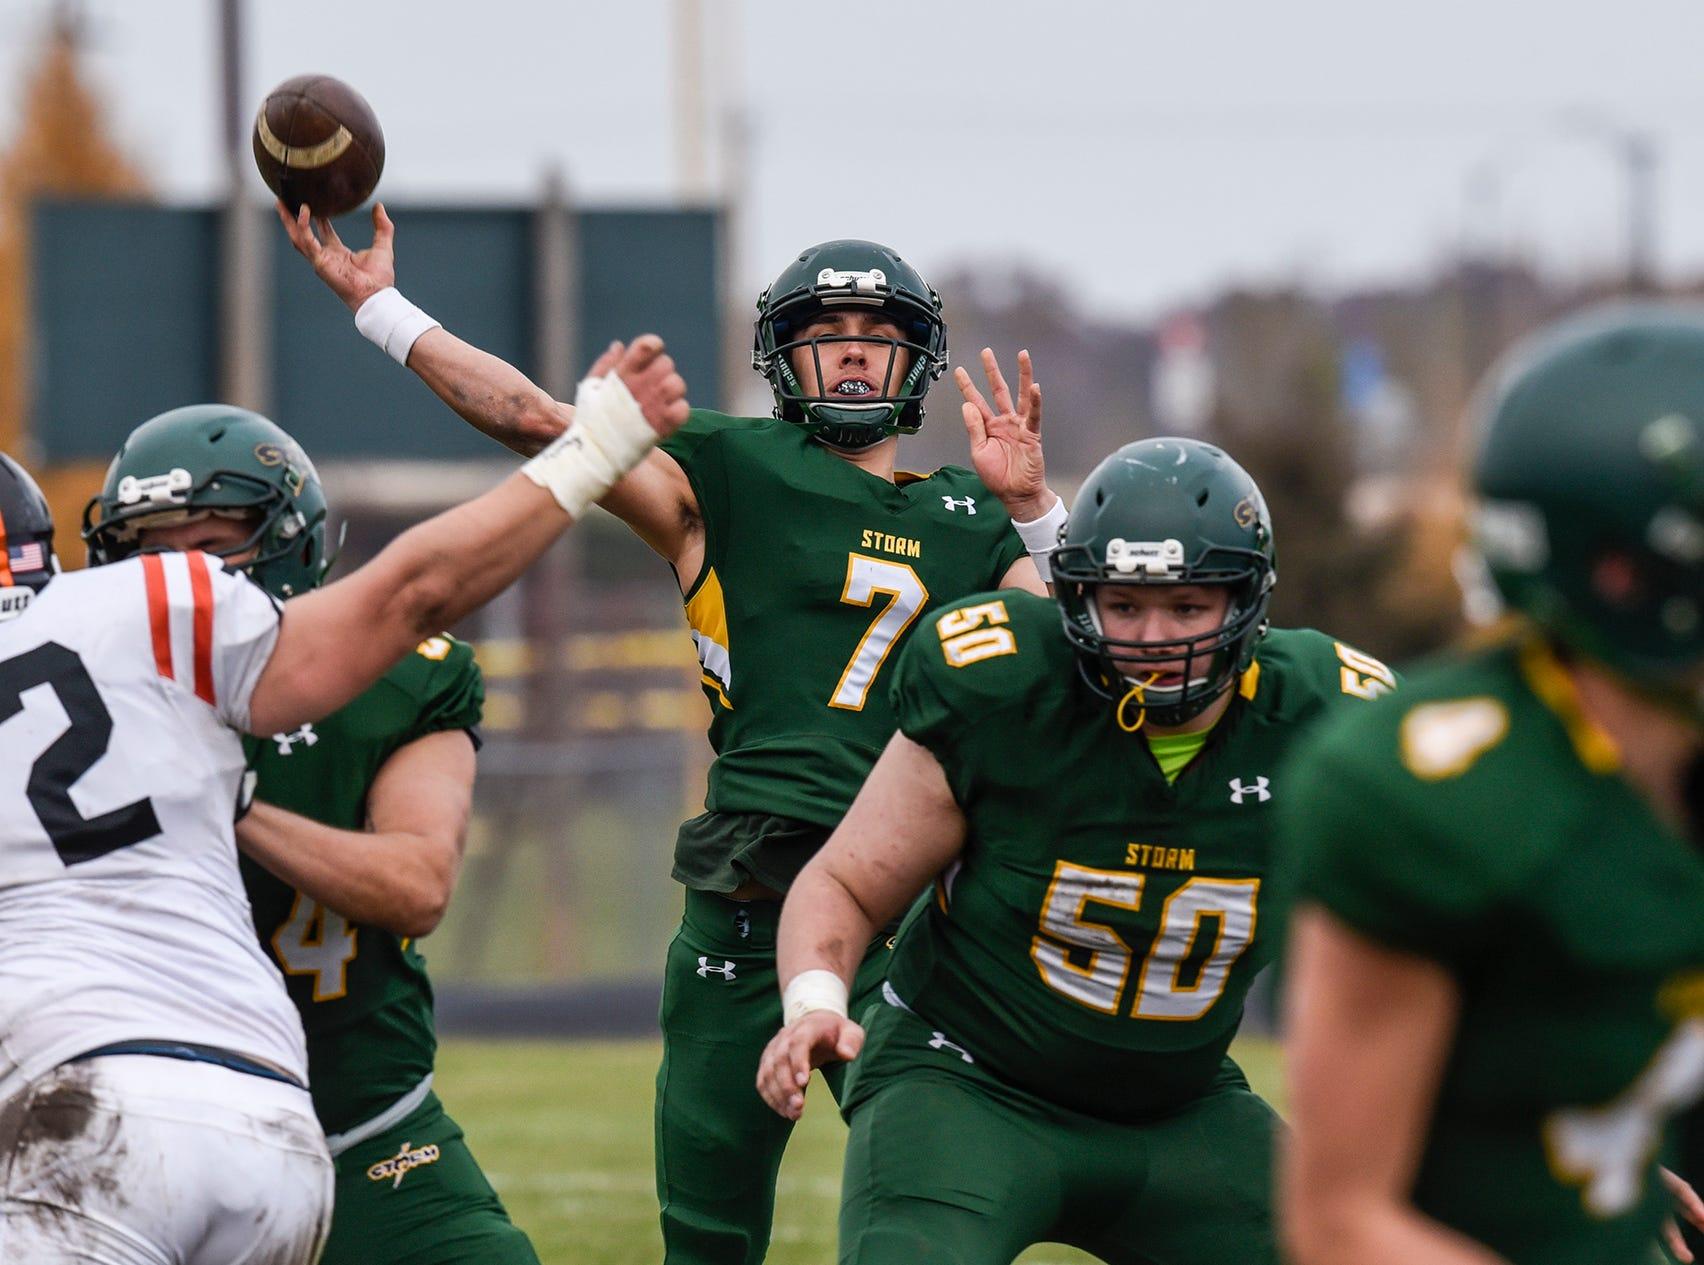 Sauk Rapids quarterback Cade Milton-Baumgardner throws a pass Saturday, Oct. 27, during the Section 6-5A semifinal game against St. Cloud Tech in Sauk Rapids.